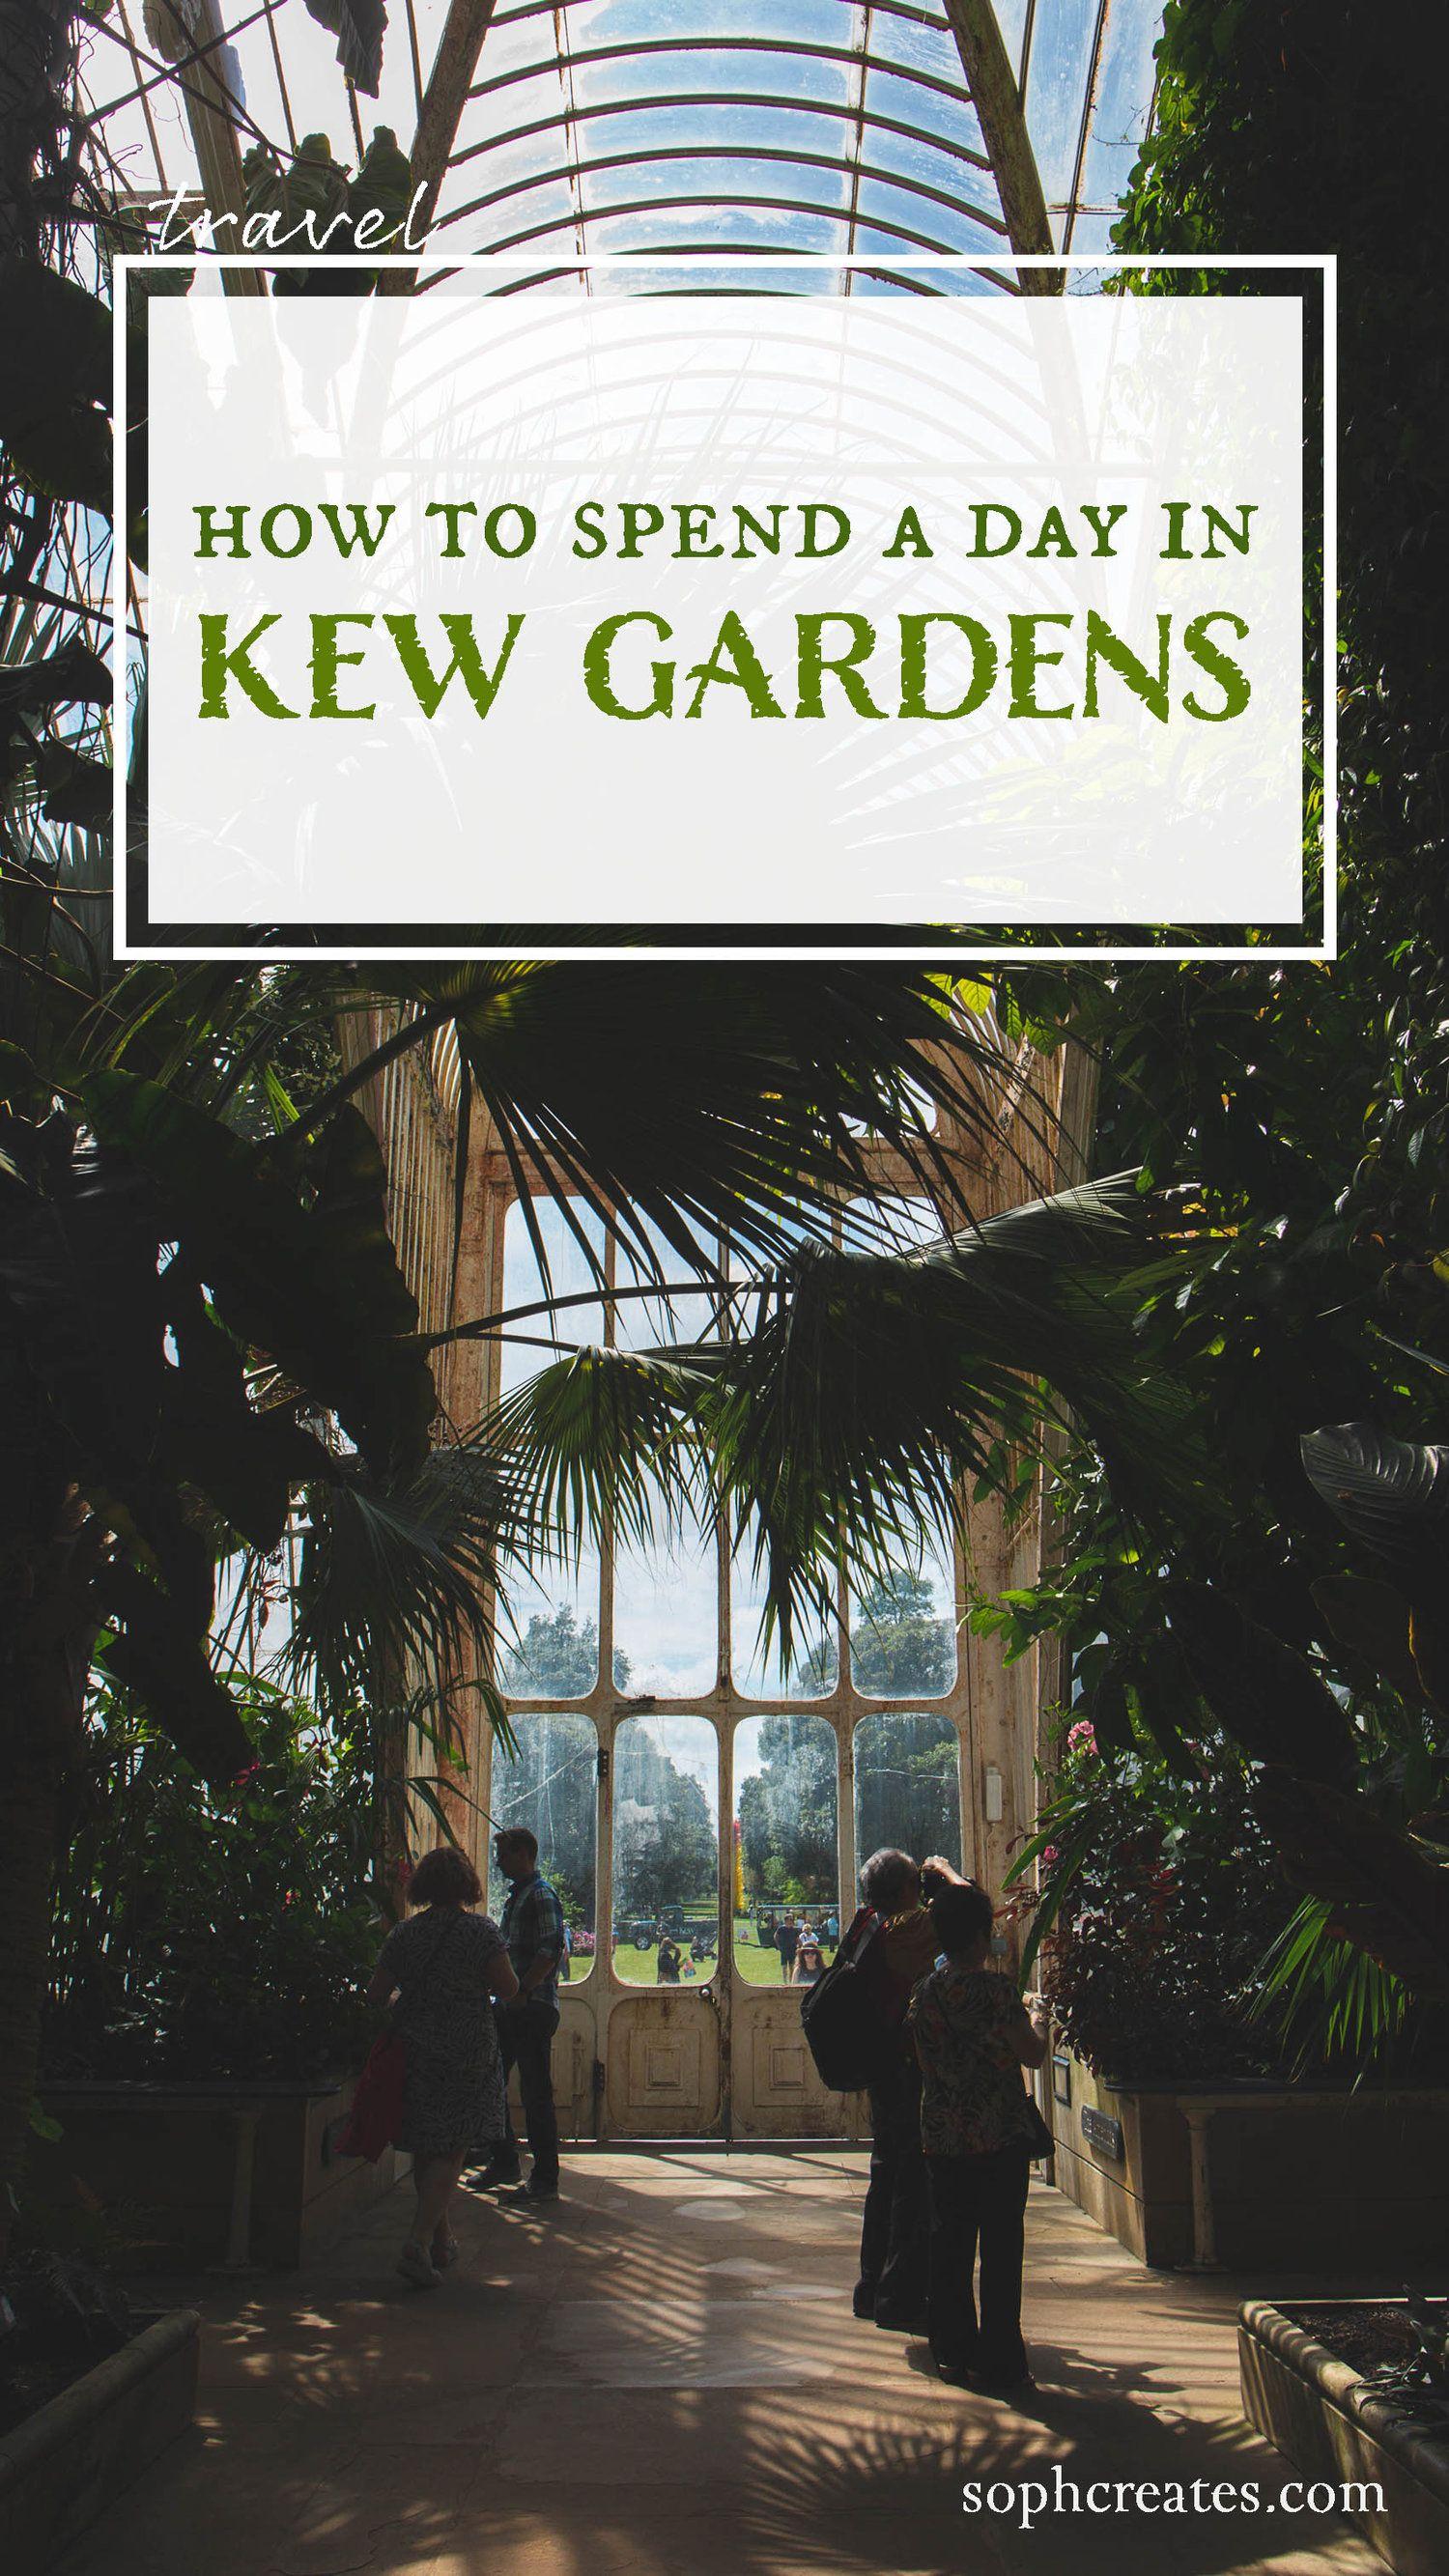 eaad445c4bfd5bdf86ae8c9f45f89798 - Best Day To Visit Kew Gardens